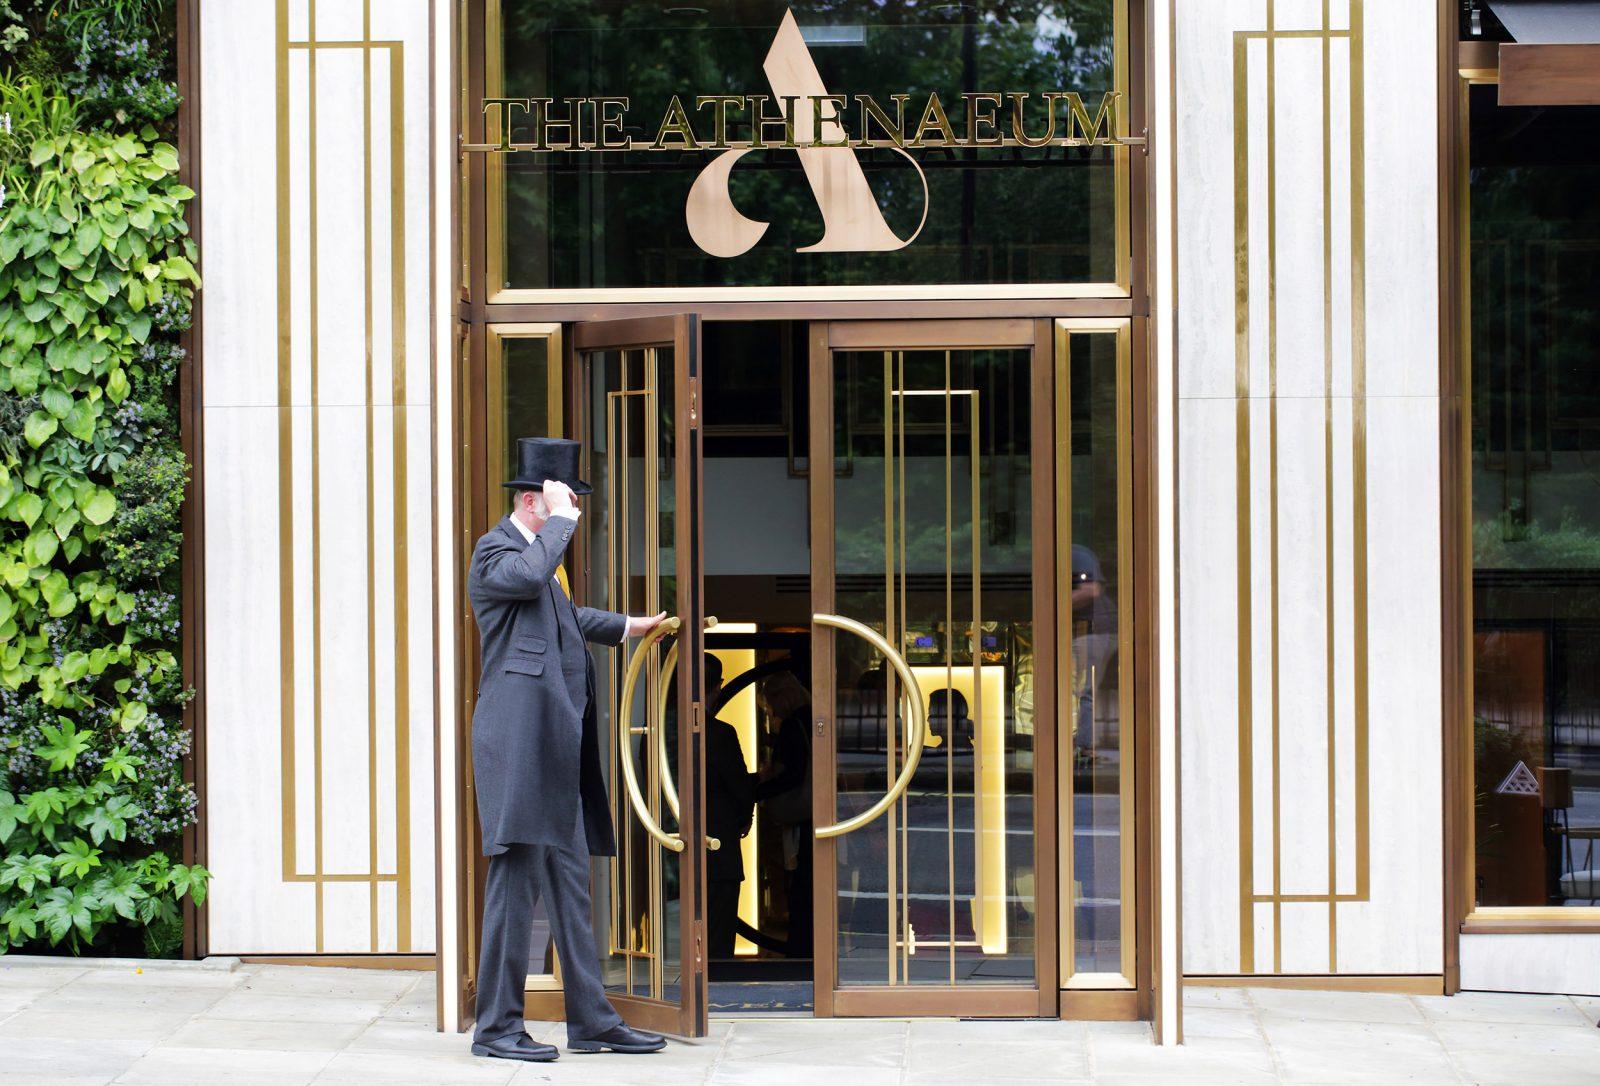 Athenaeum Entrance